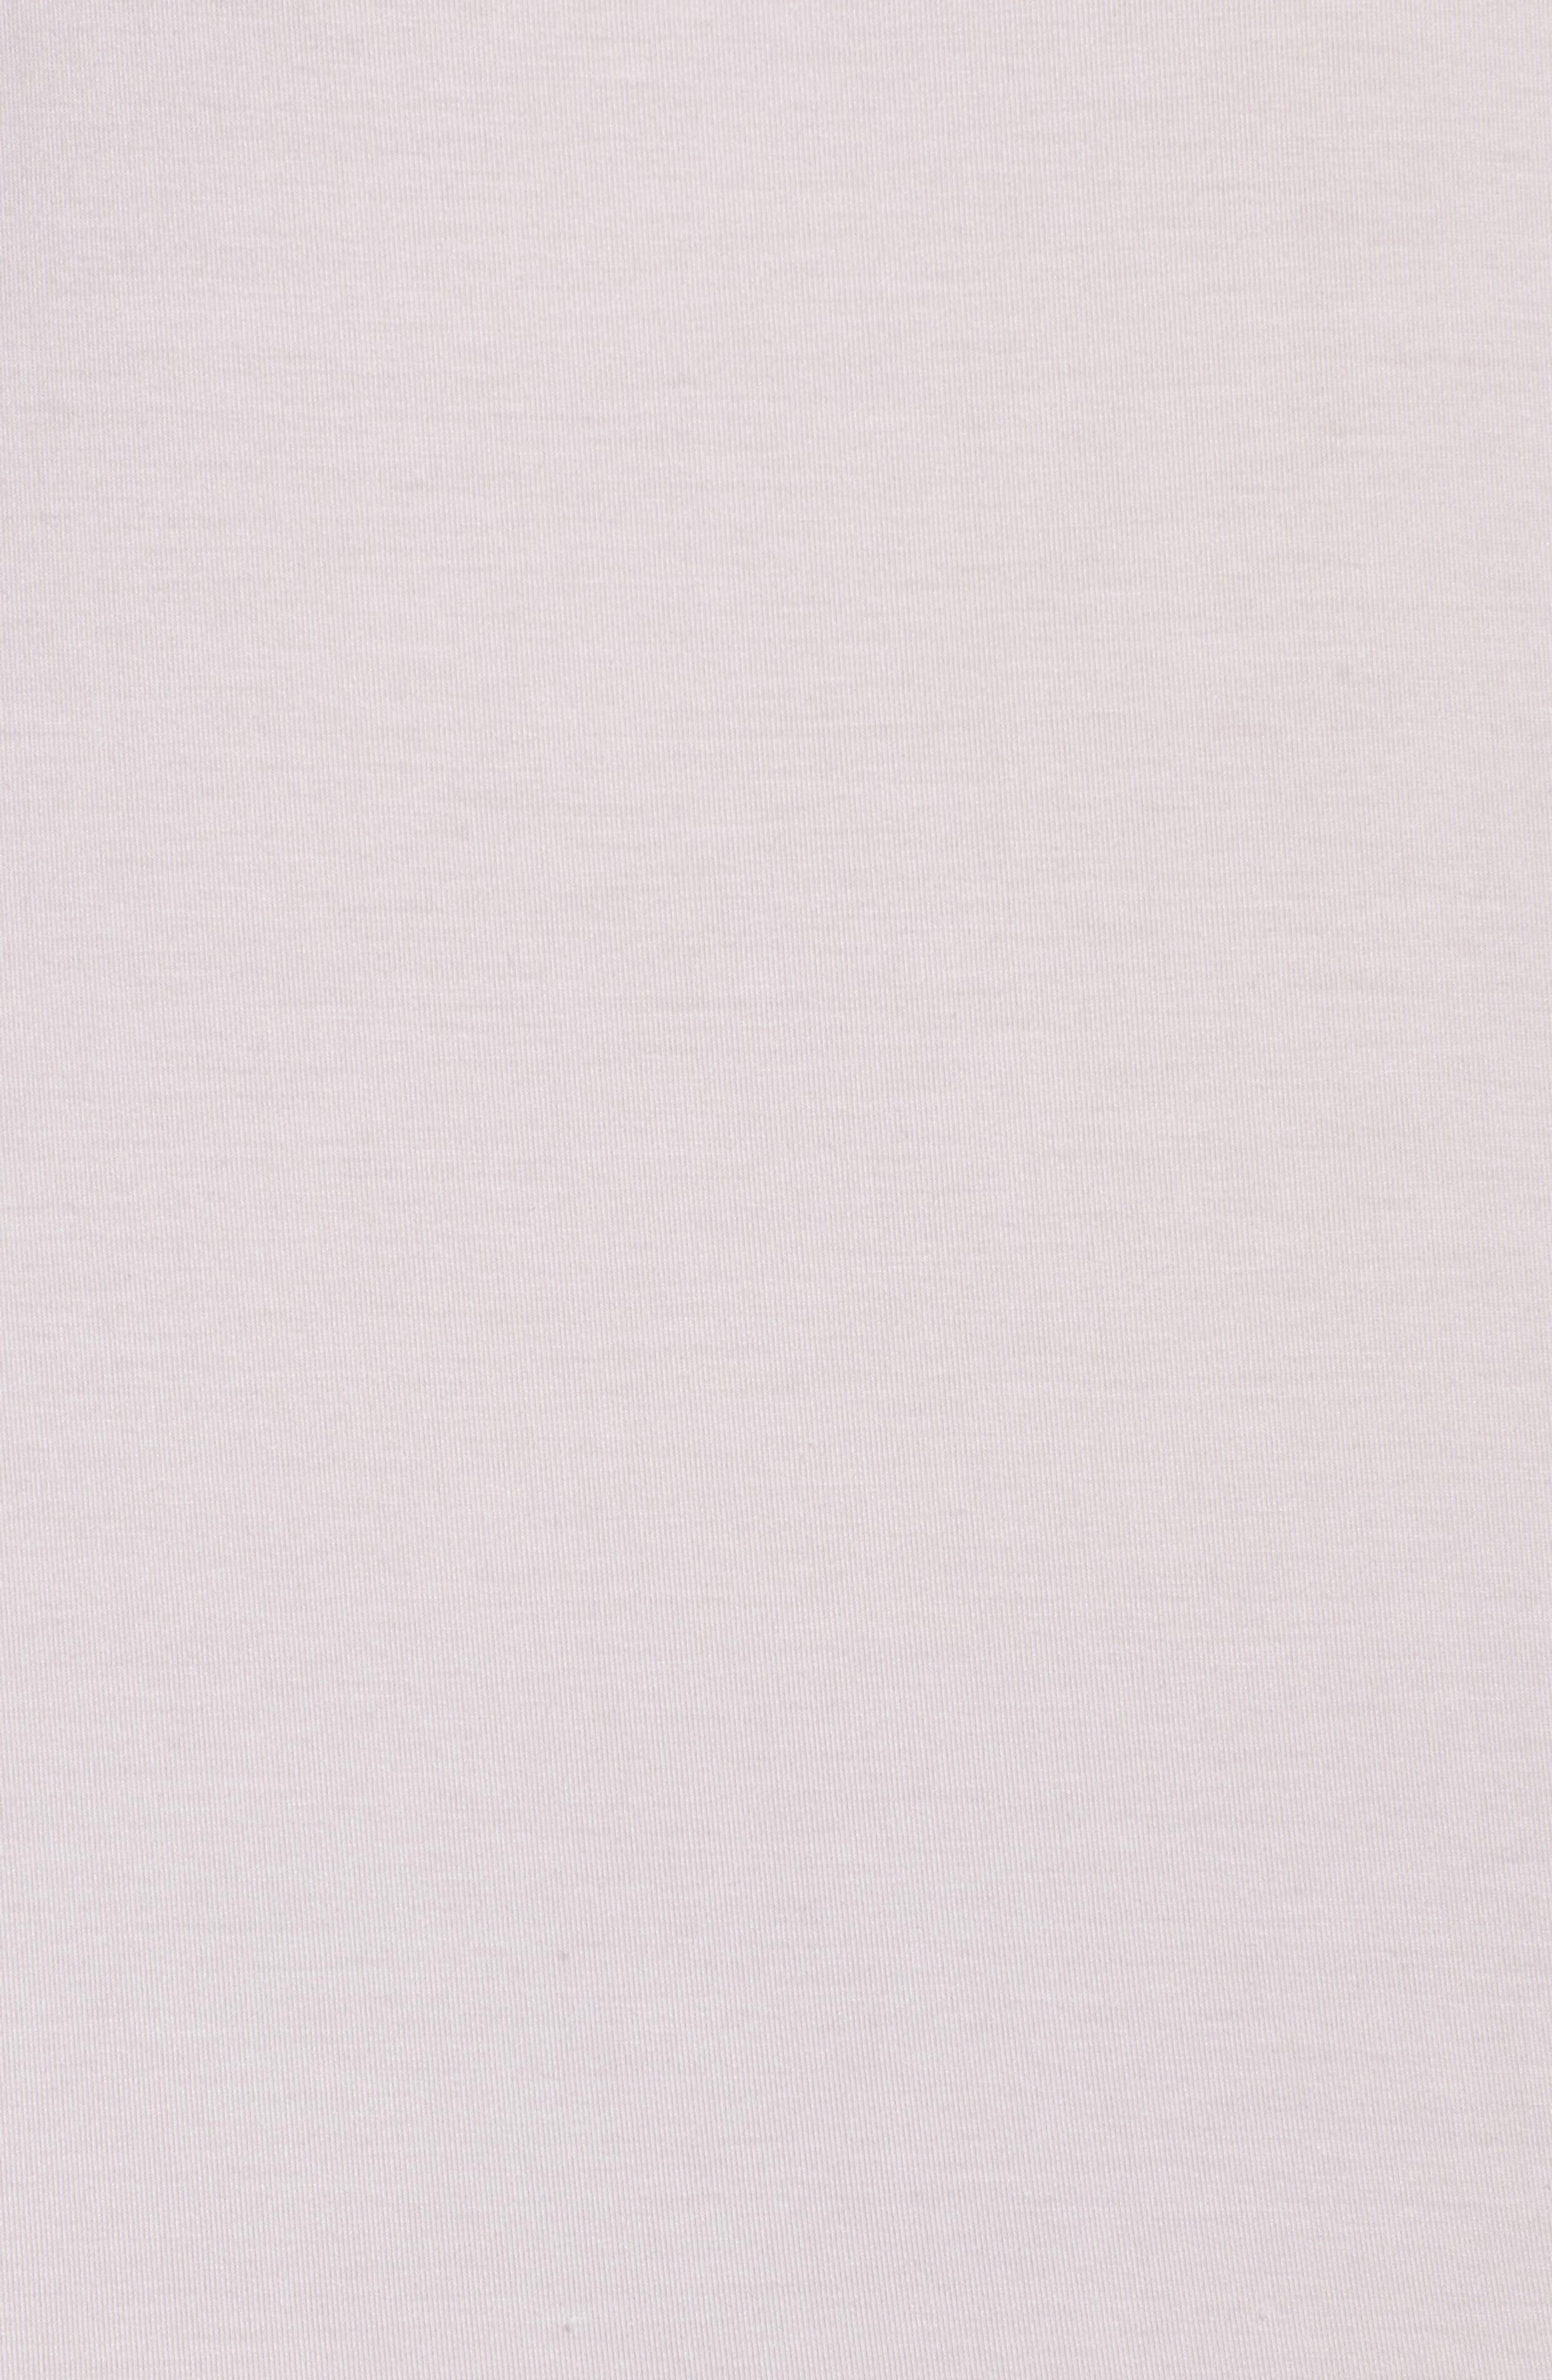 Dolman Sleeve Nightshirt,                             Alternate thumbnail 30, color,